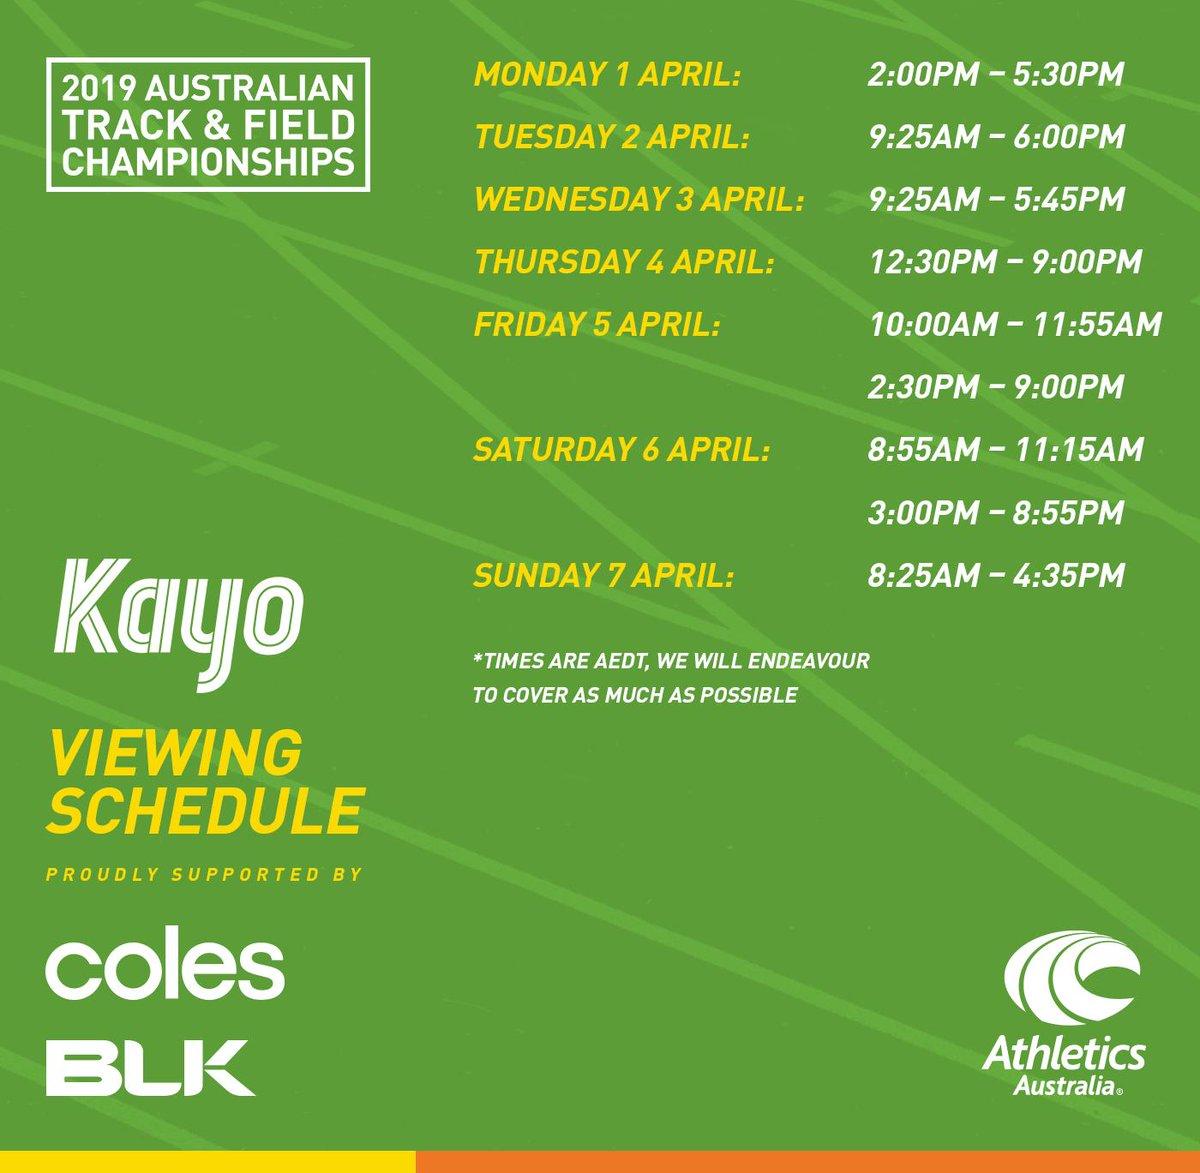 Athletics Australia on Twitter: